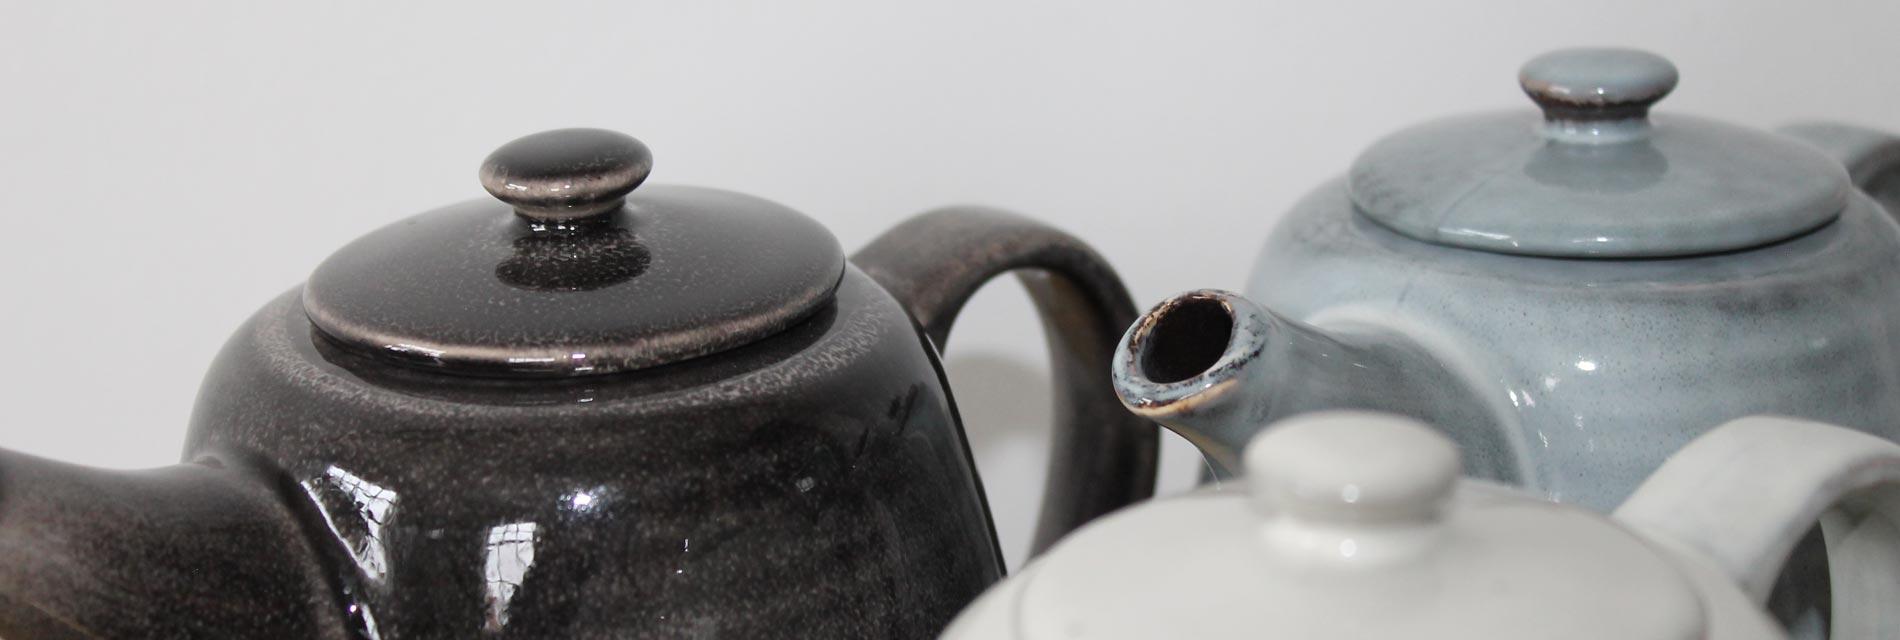 Broste Tea Pots